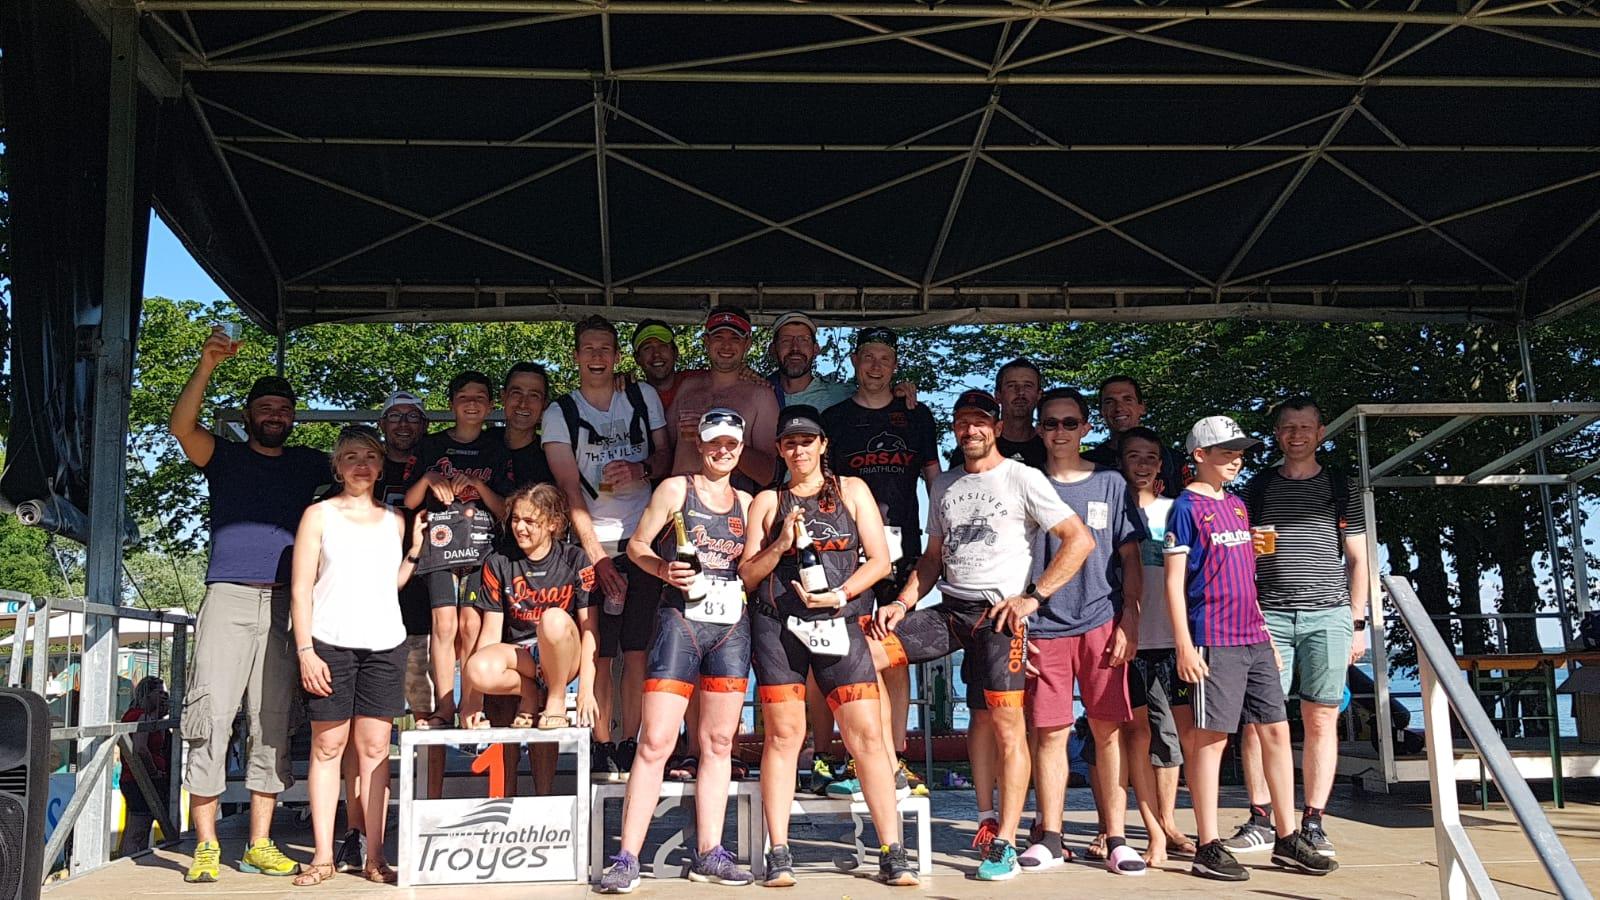 Triathlon de Troyes et FrenchMan !